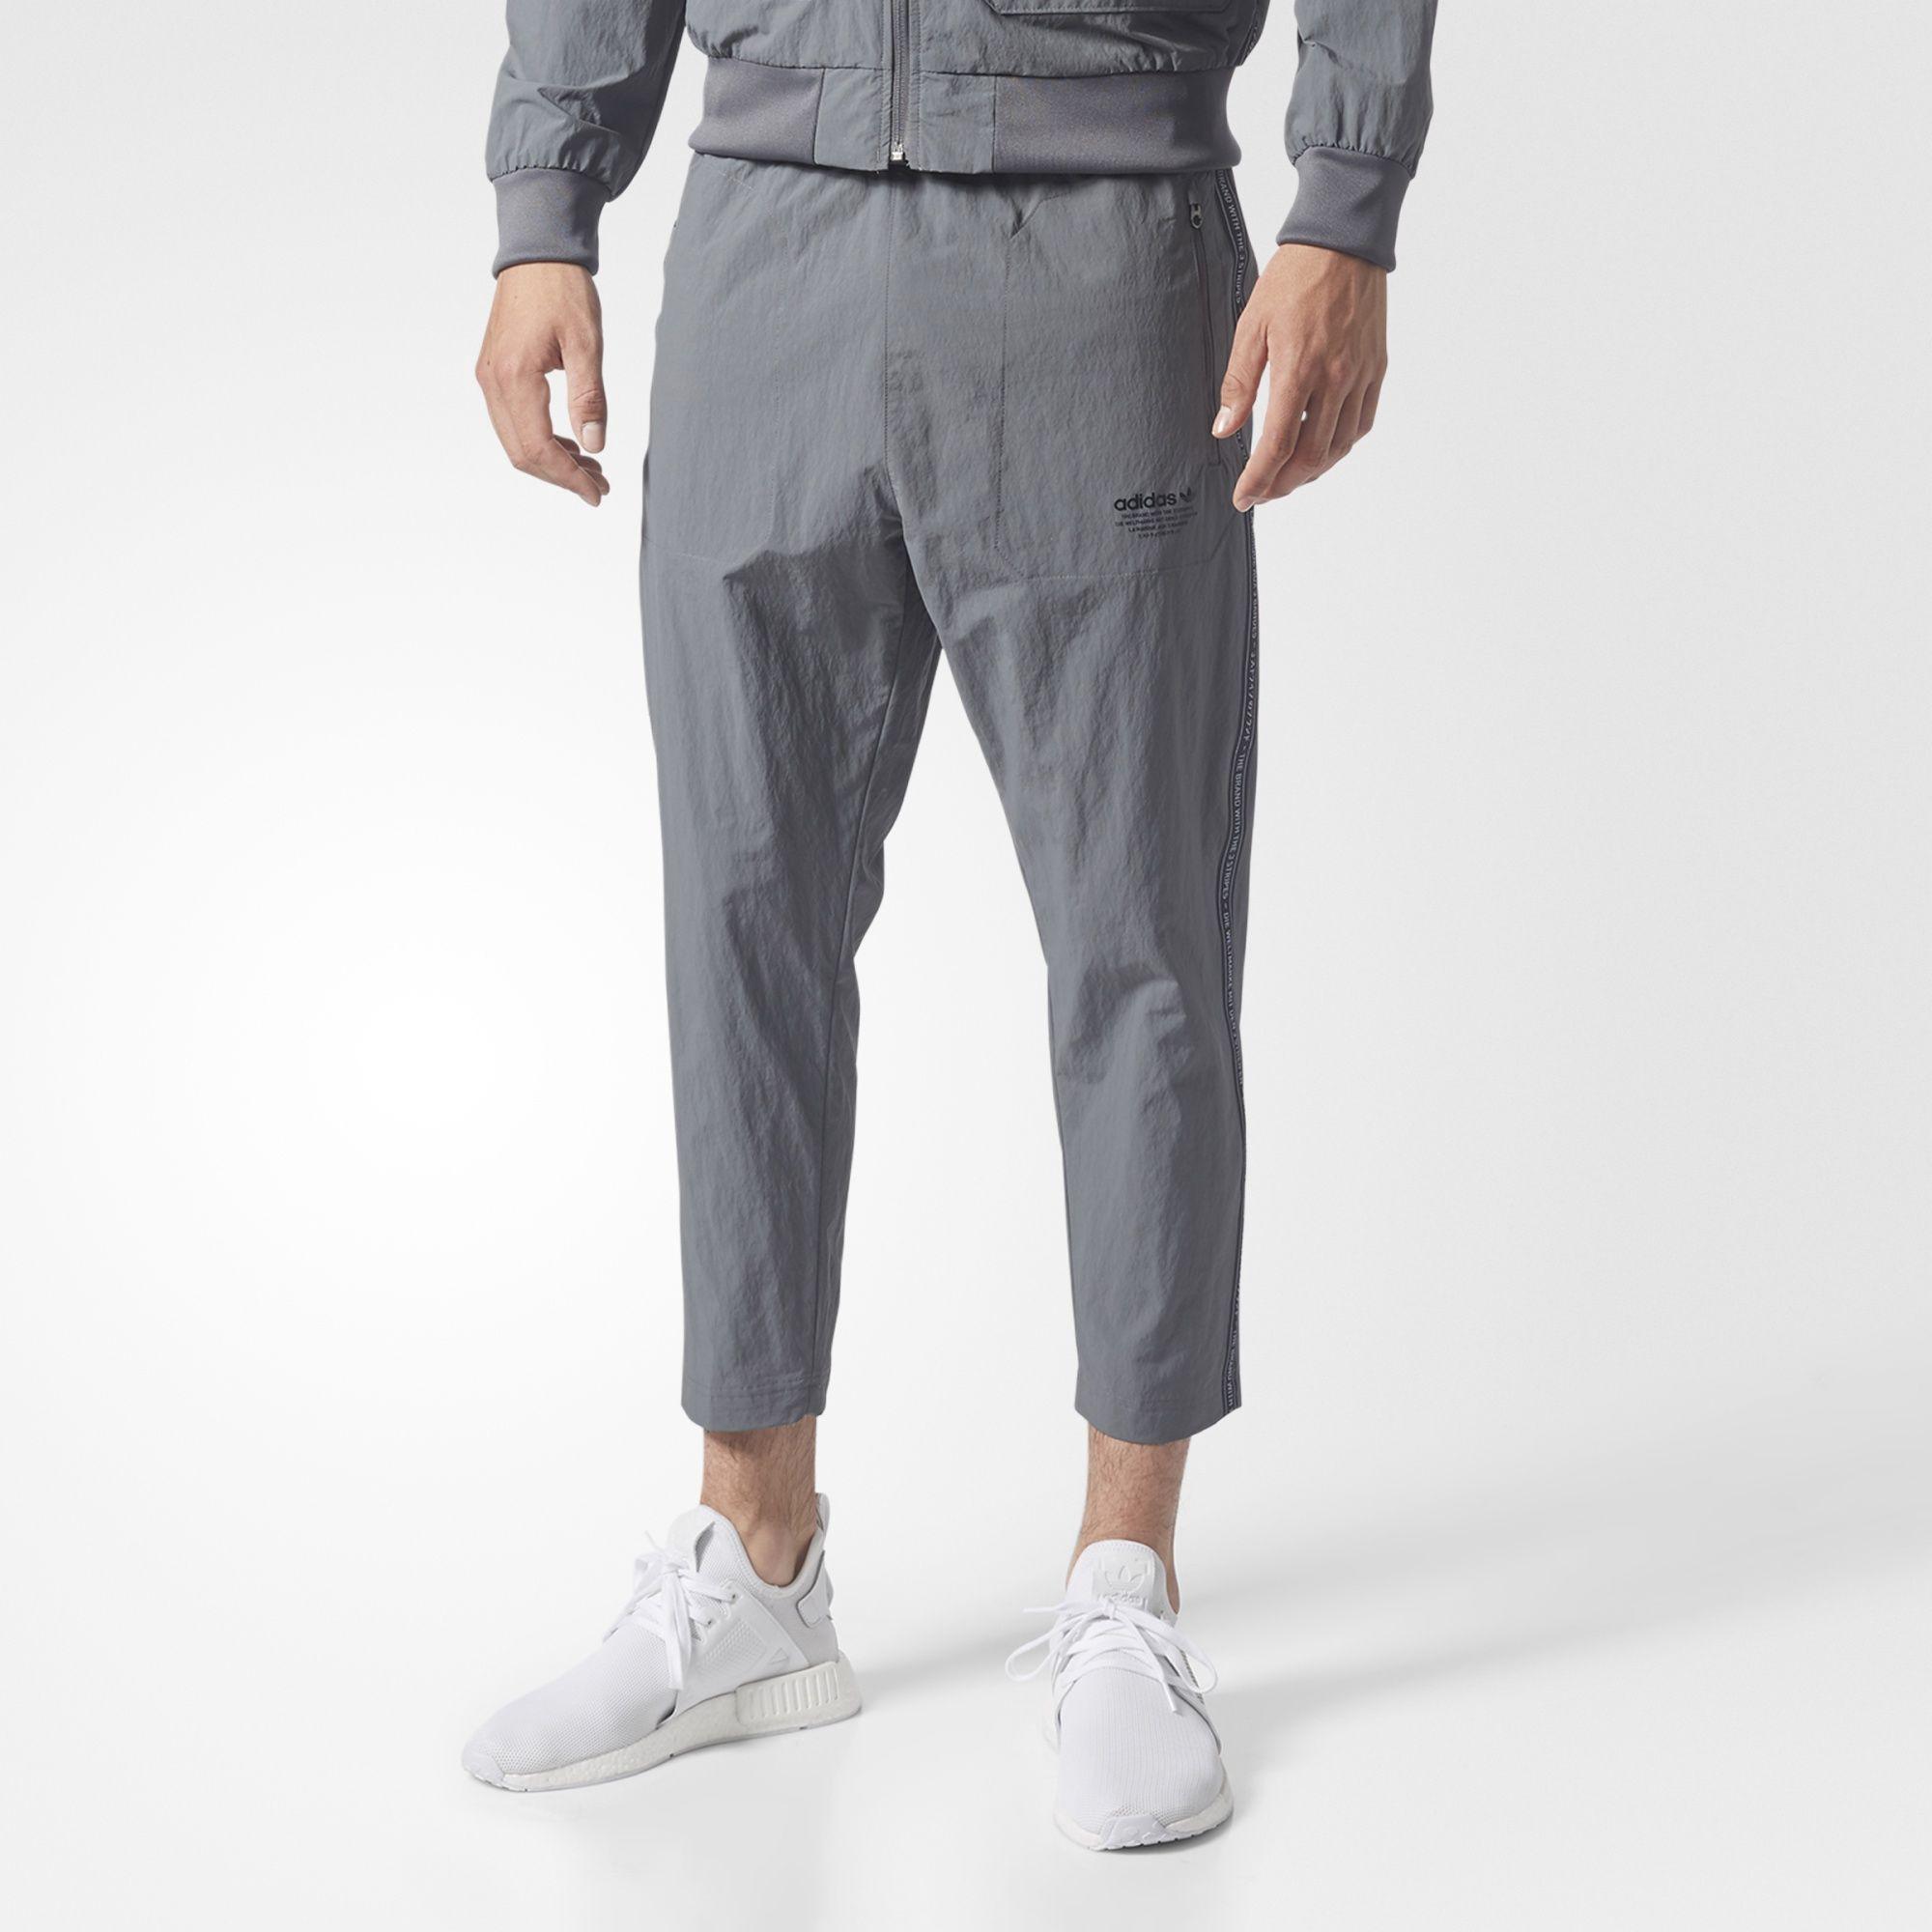 adidas utility 7 8 track pants